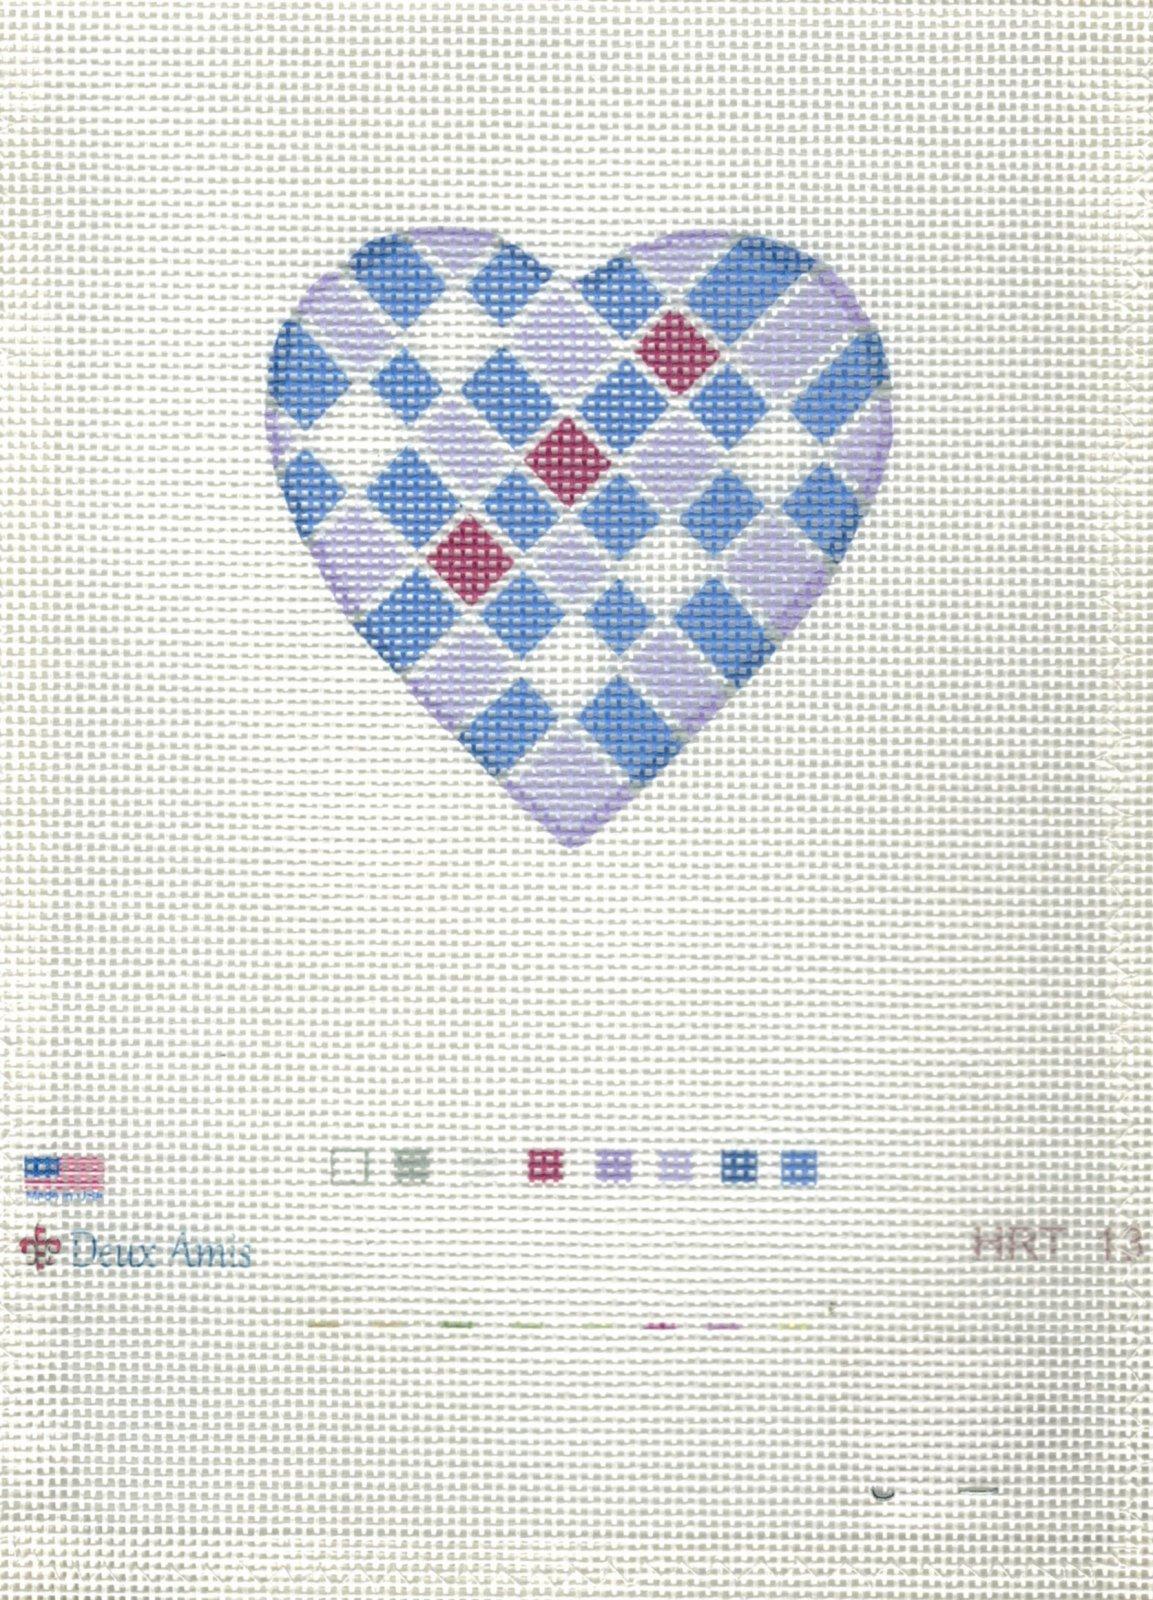 Deux Amis Mini Heart Collection